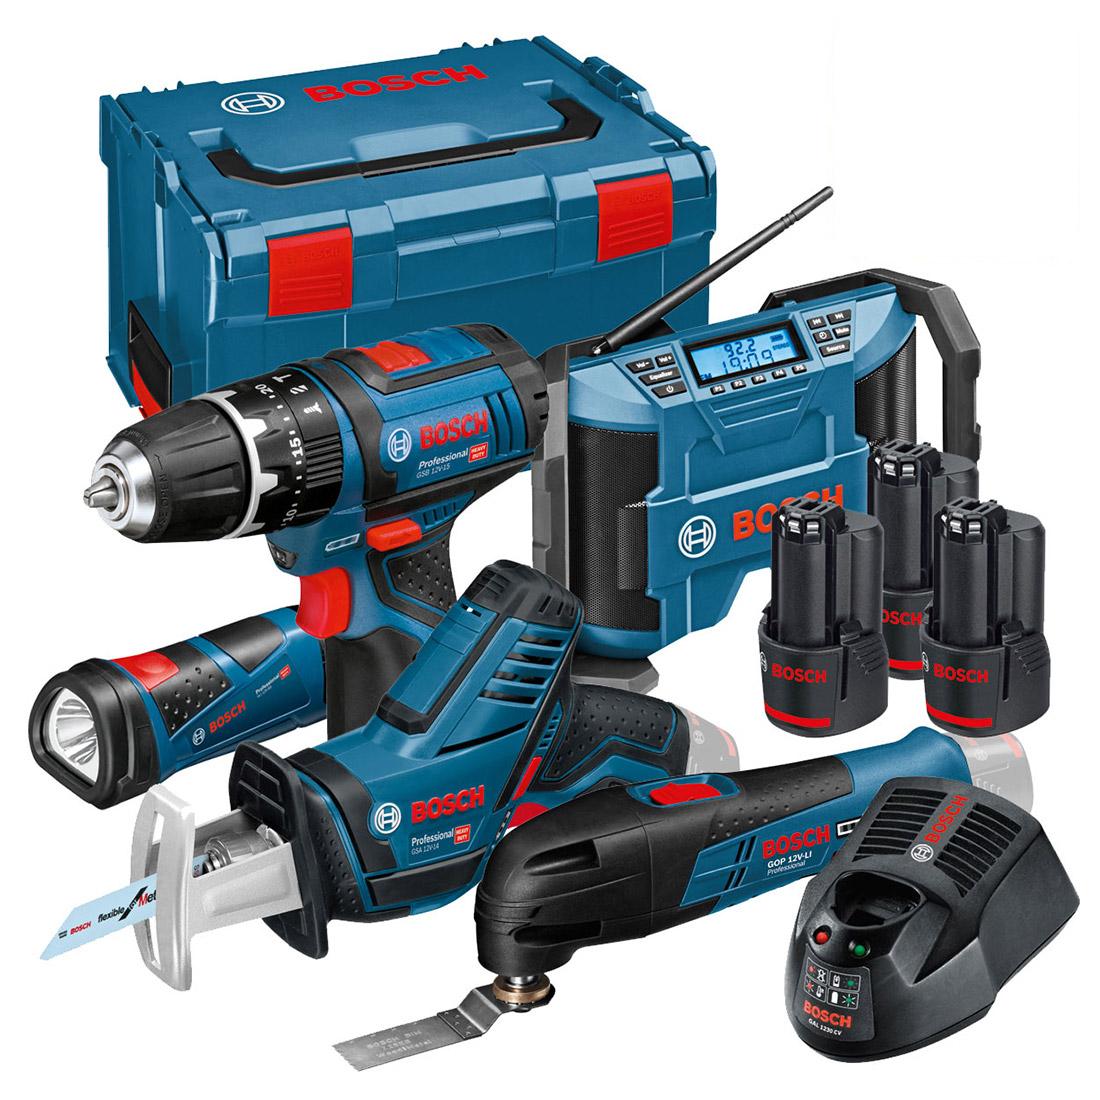 Bosch 12VGSBGPBFIVE 5 Piece 12v Tool Kit with 3x 2.0Ah Batts in L-Boxx 0615990GF1